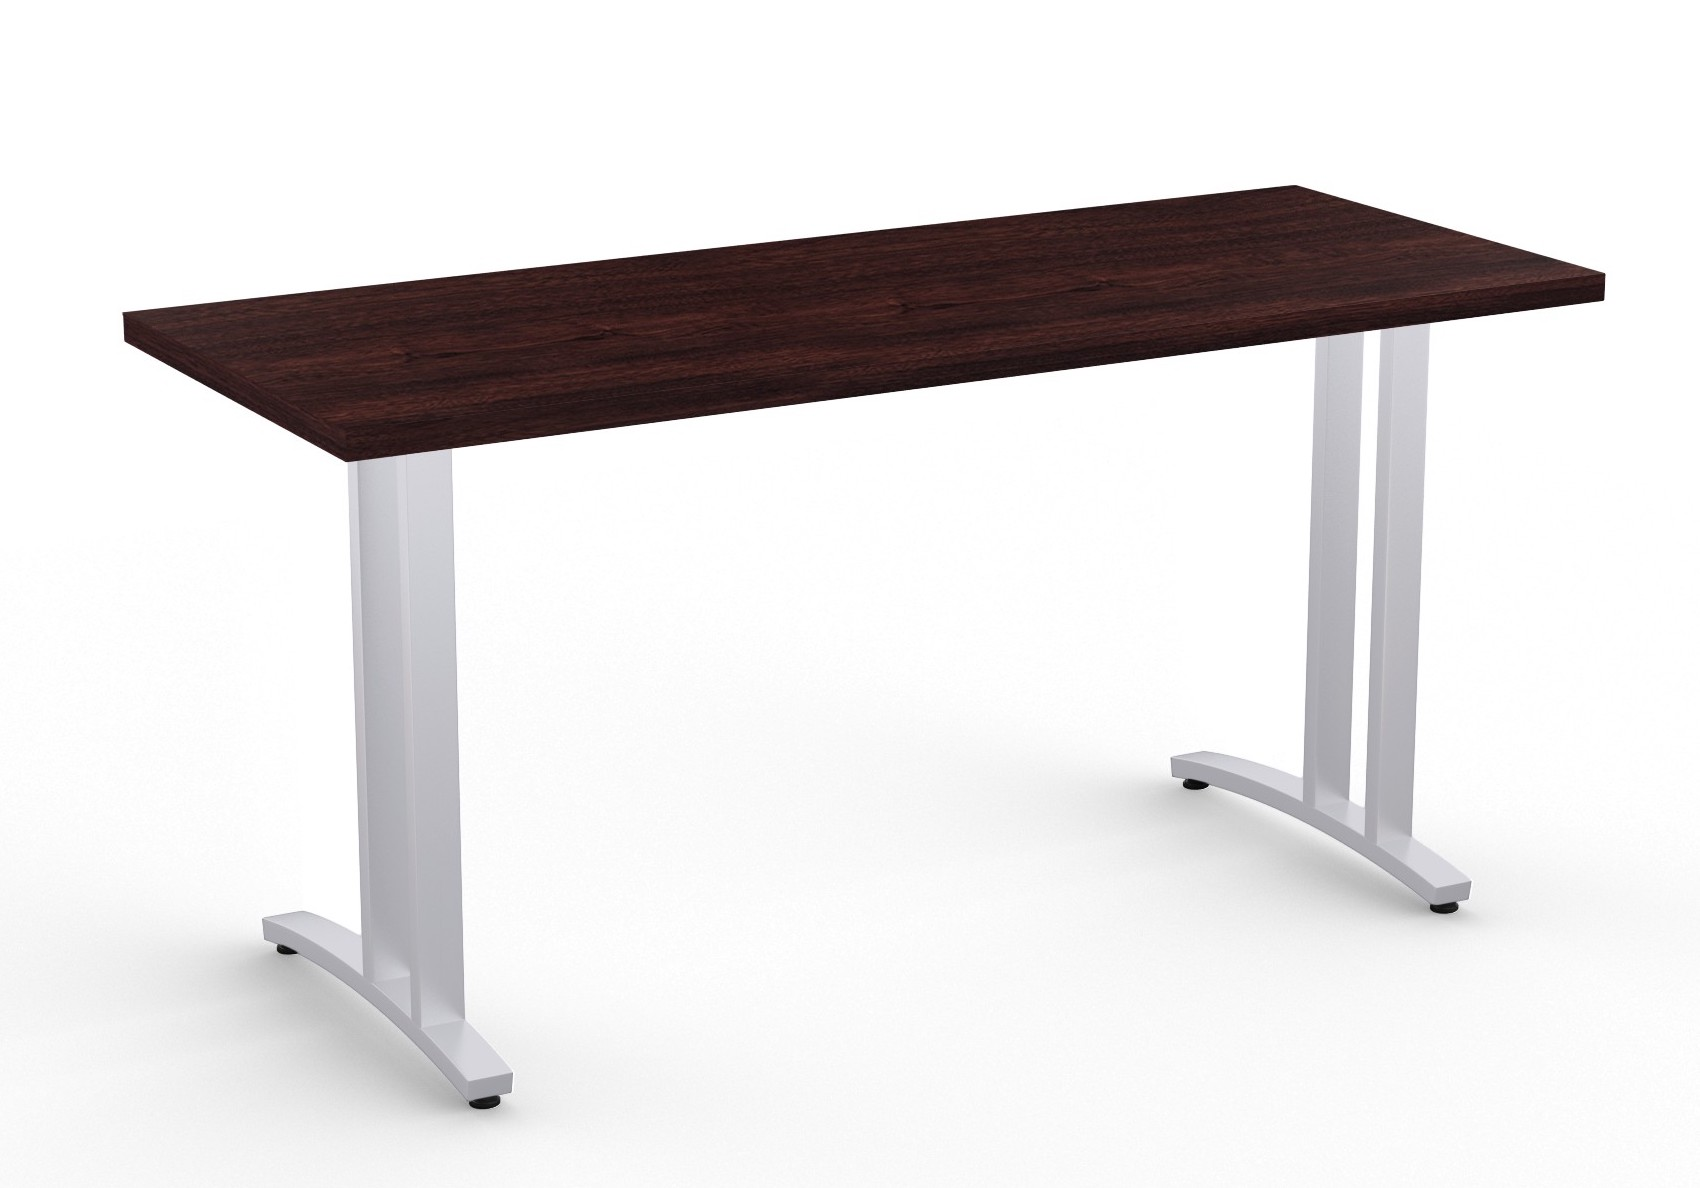 structure 2cl table in espresso